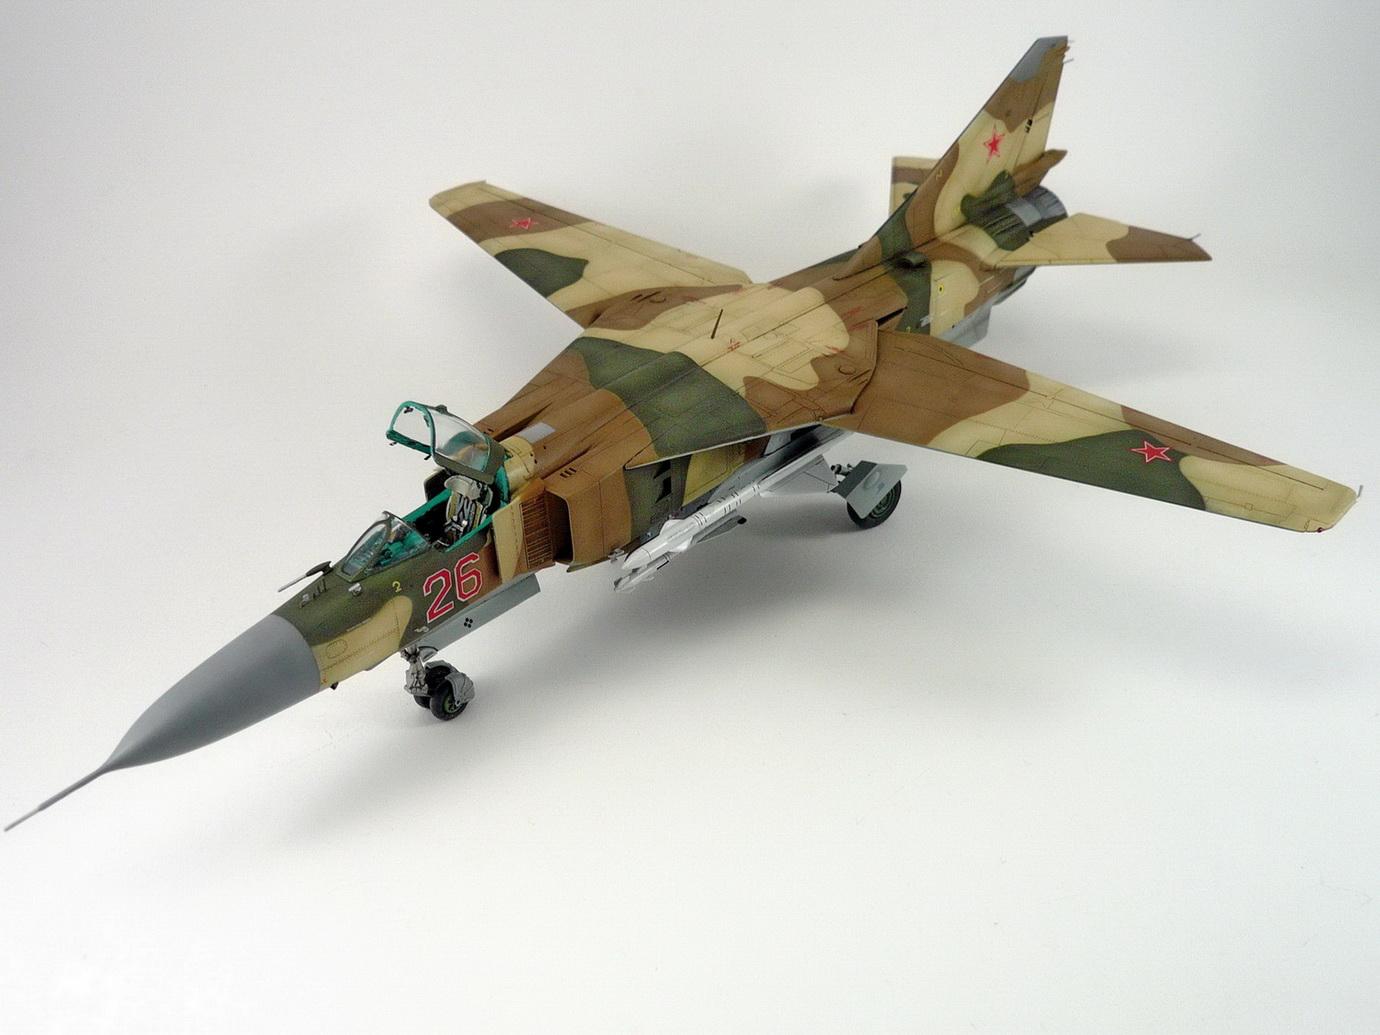 Mikoyan-Gurevich MiG-23ML, Trumpeter 1/48